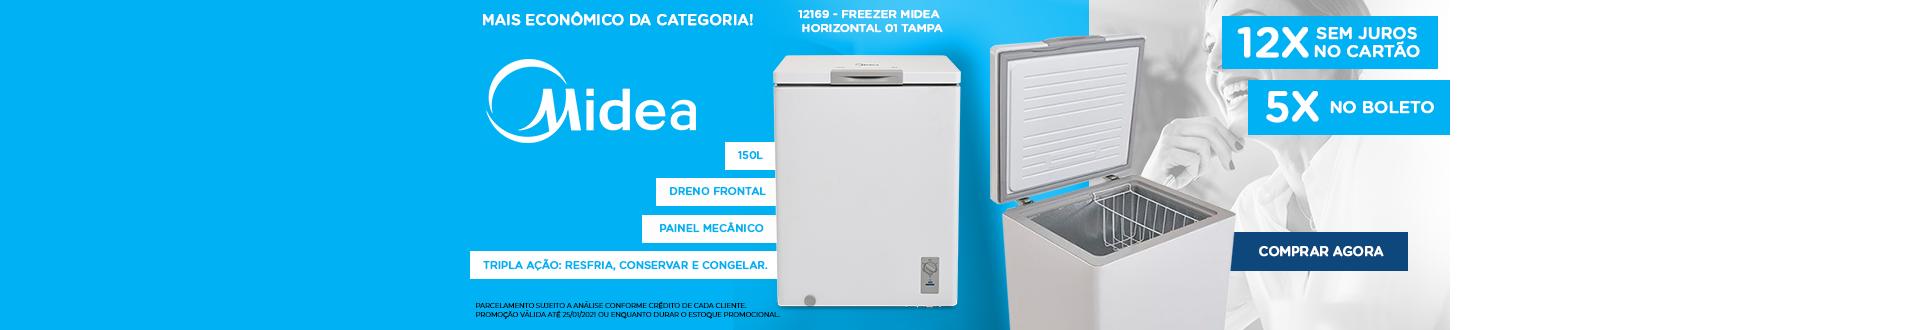 Oferta Especial Freezer Midea